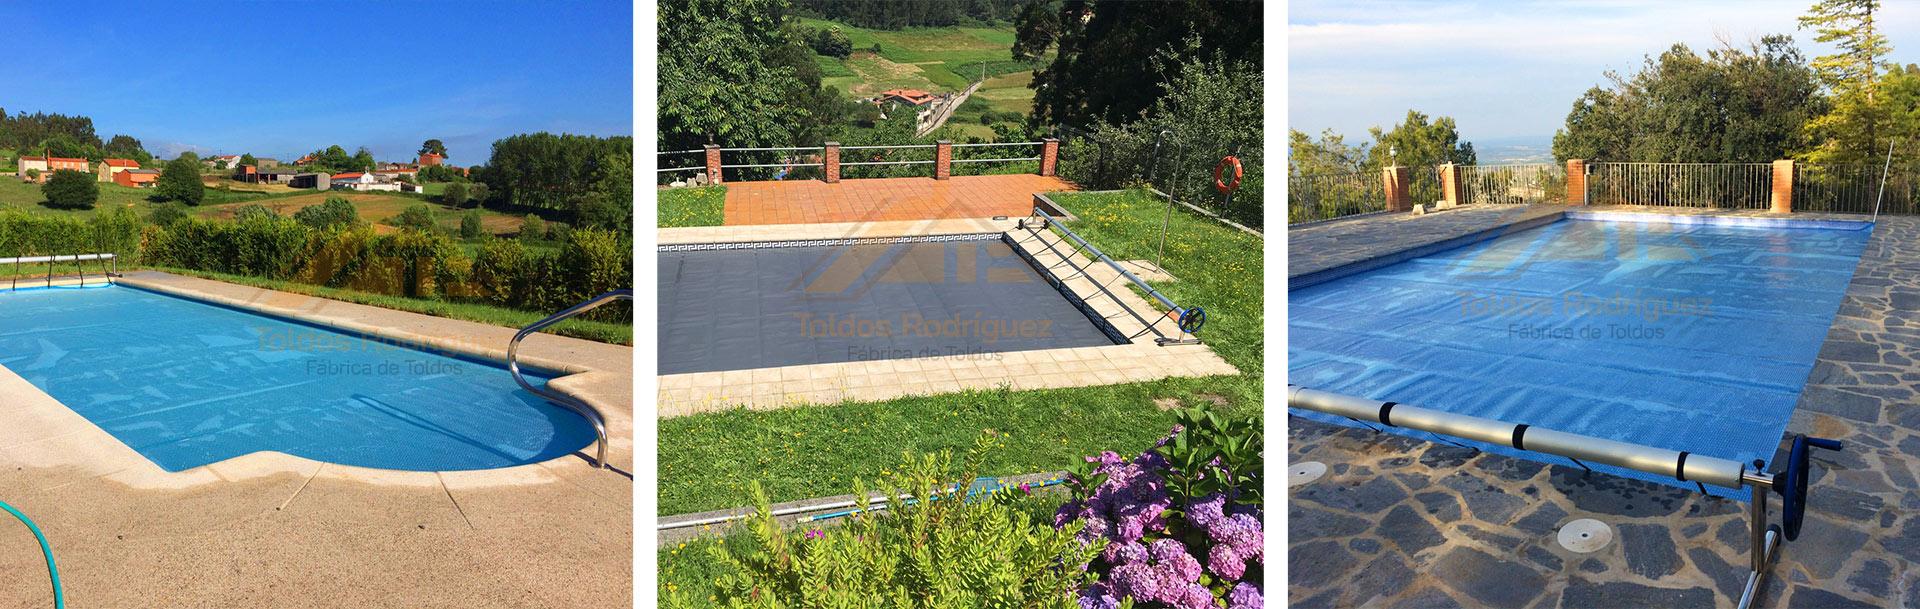 mantas-termicas-protectores-piscinas-fabrica-jaen